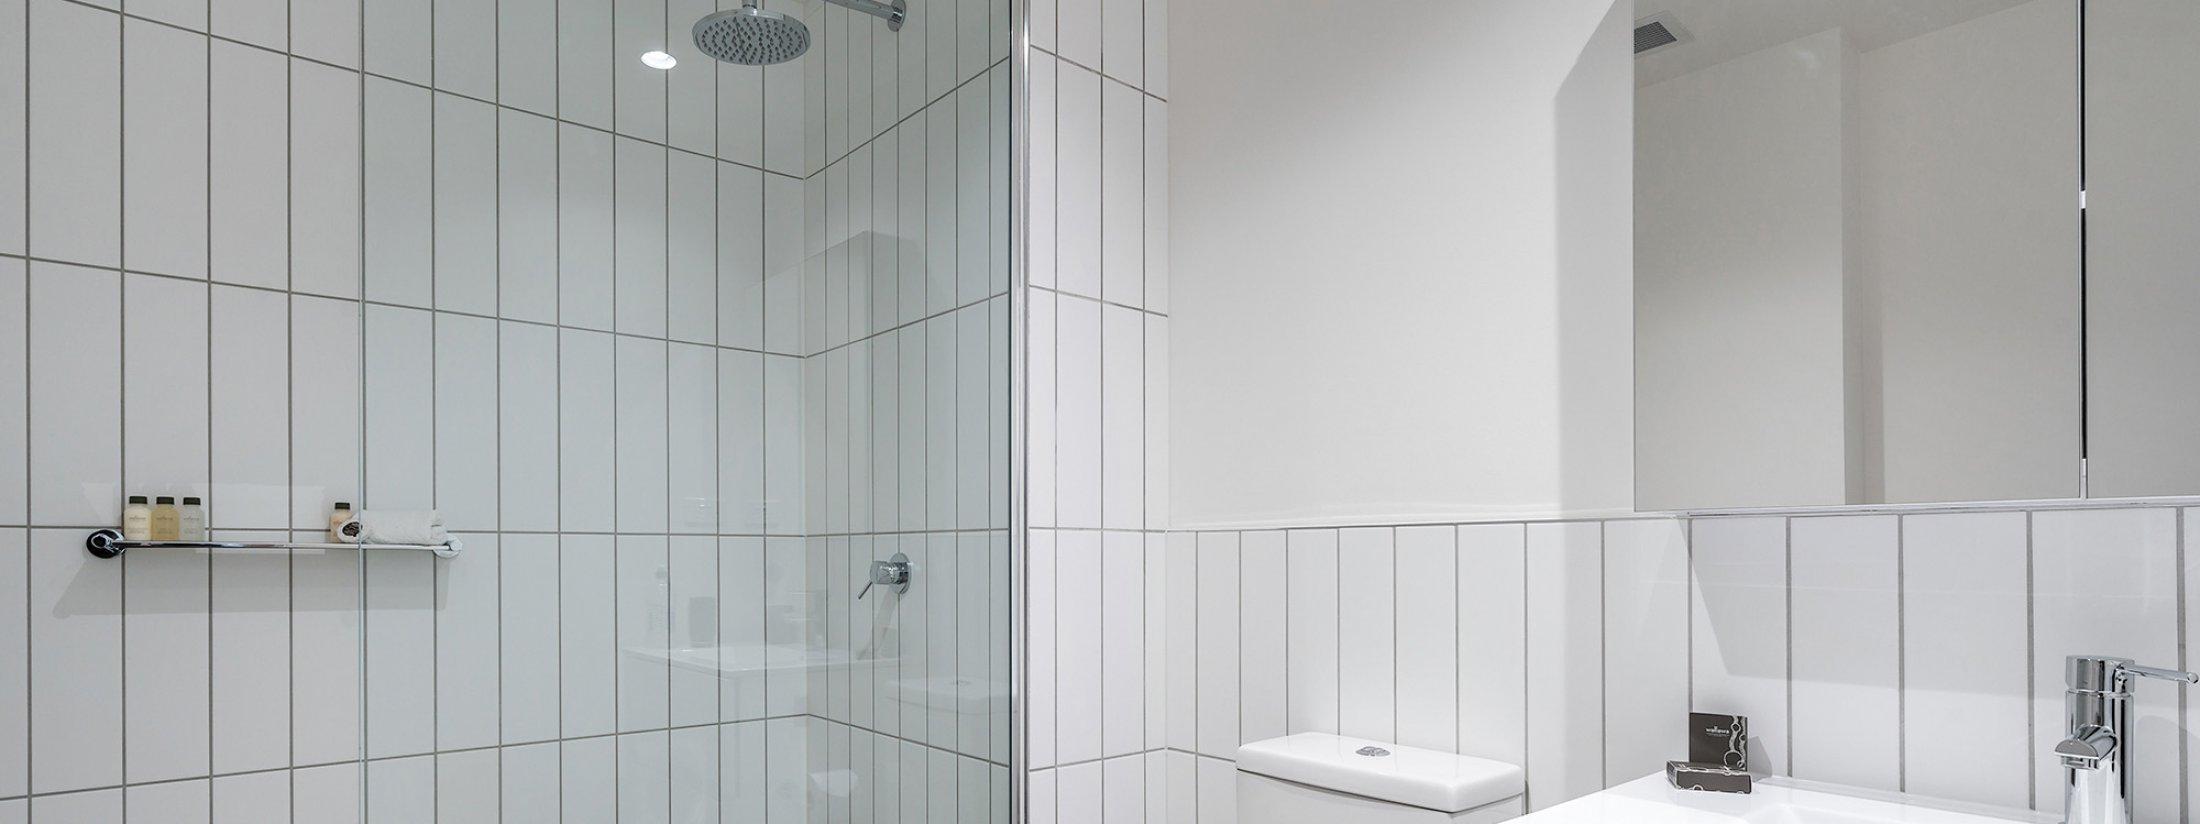 Axel Apartments - The Radnor - Glen Iris - Bathroom